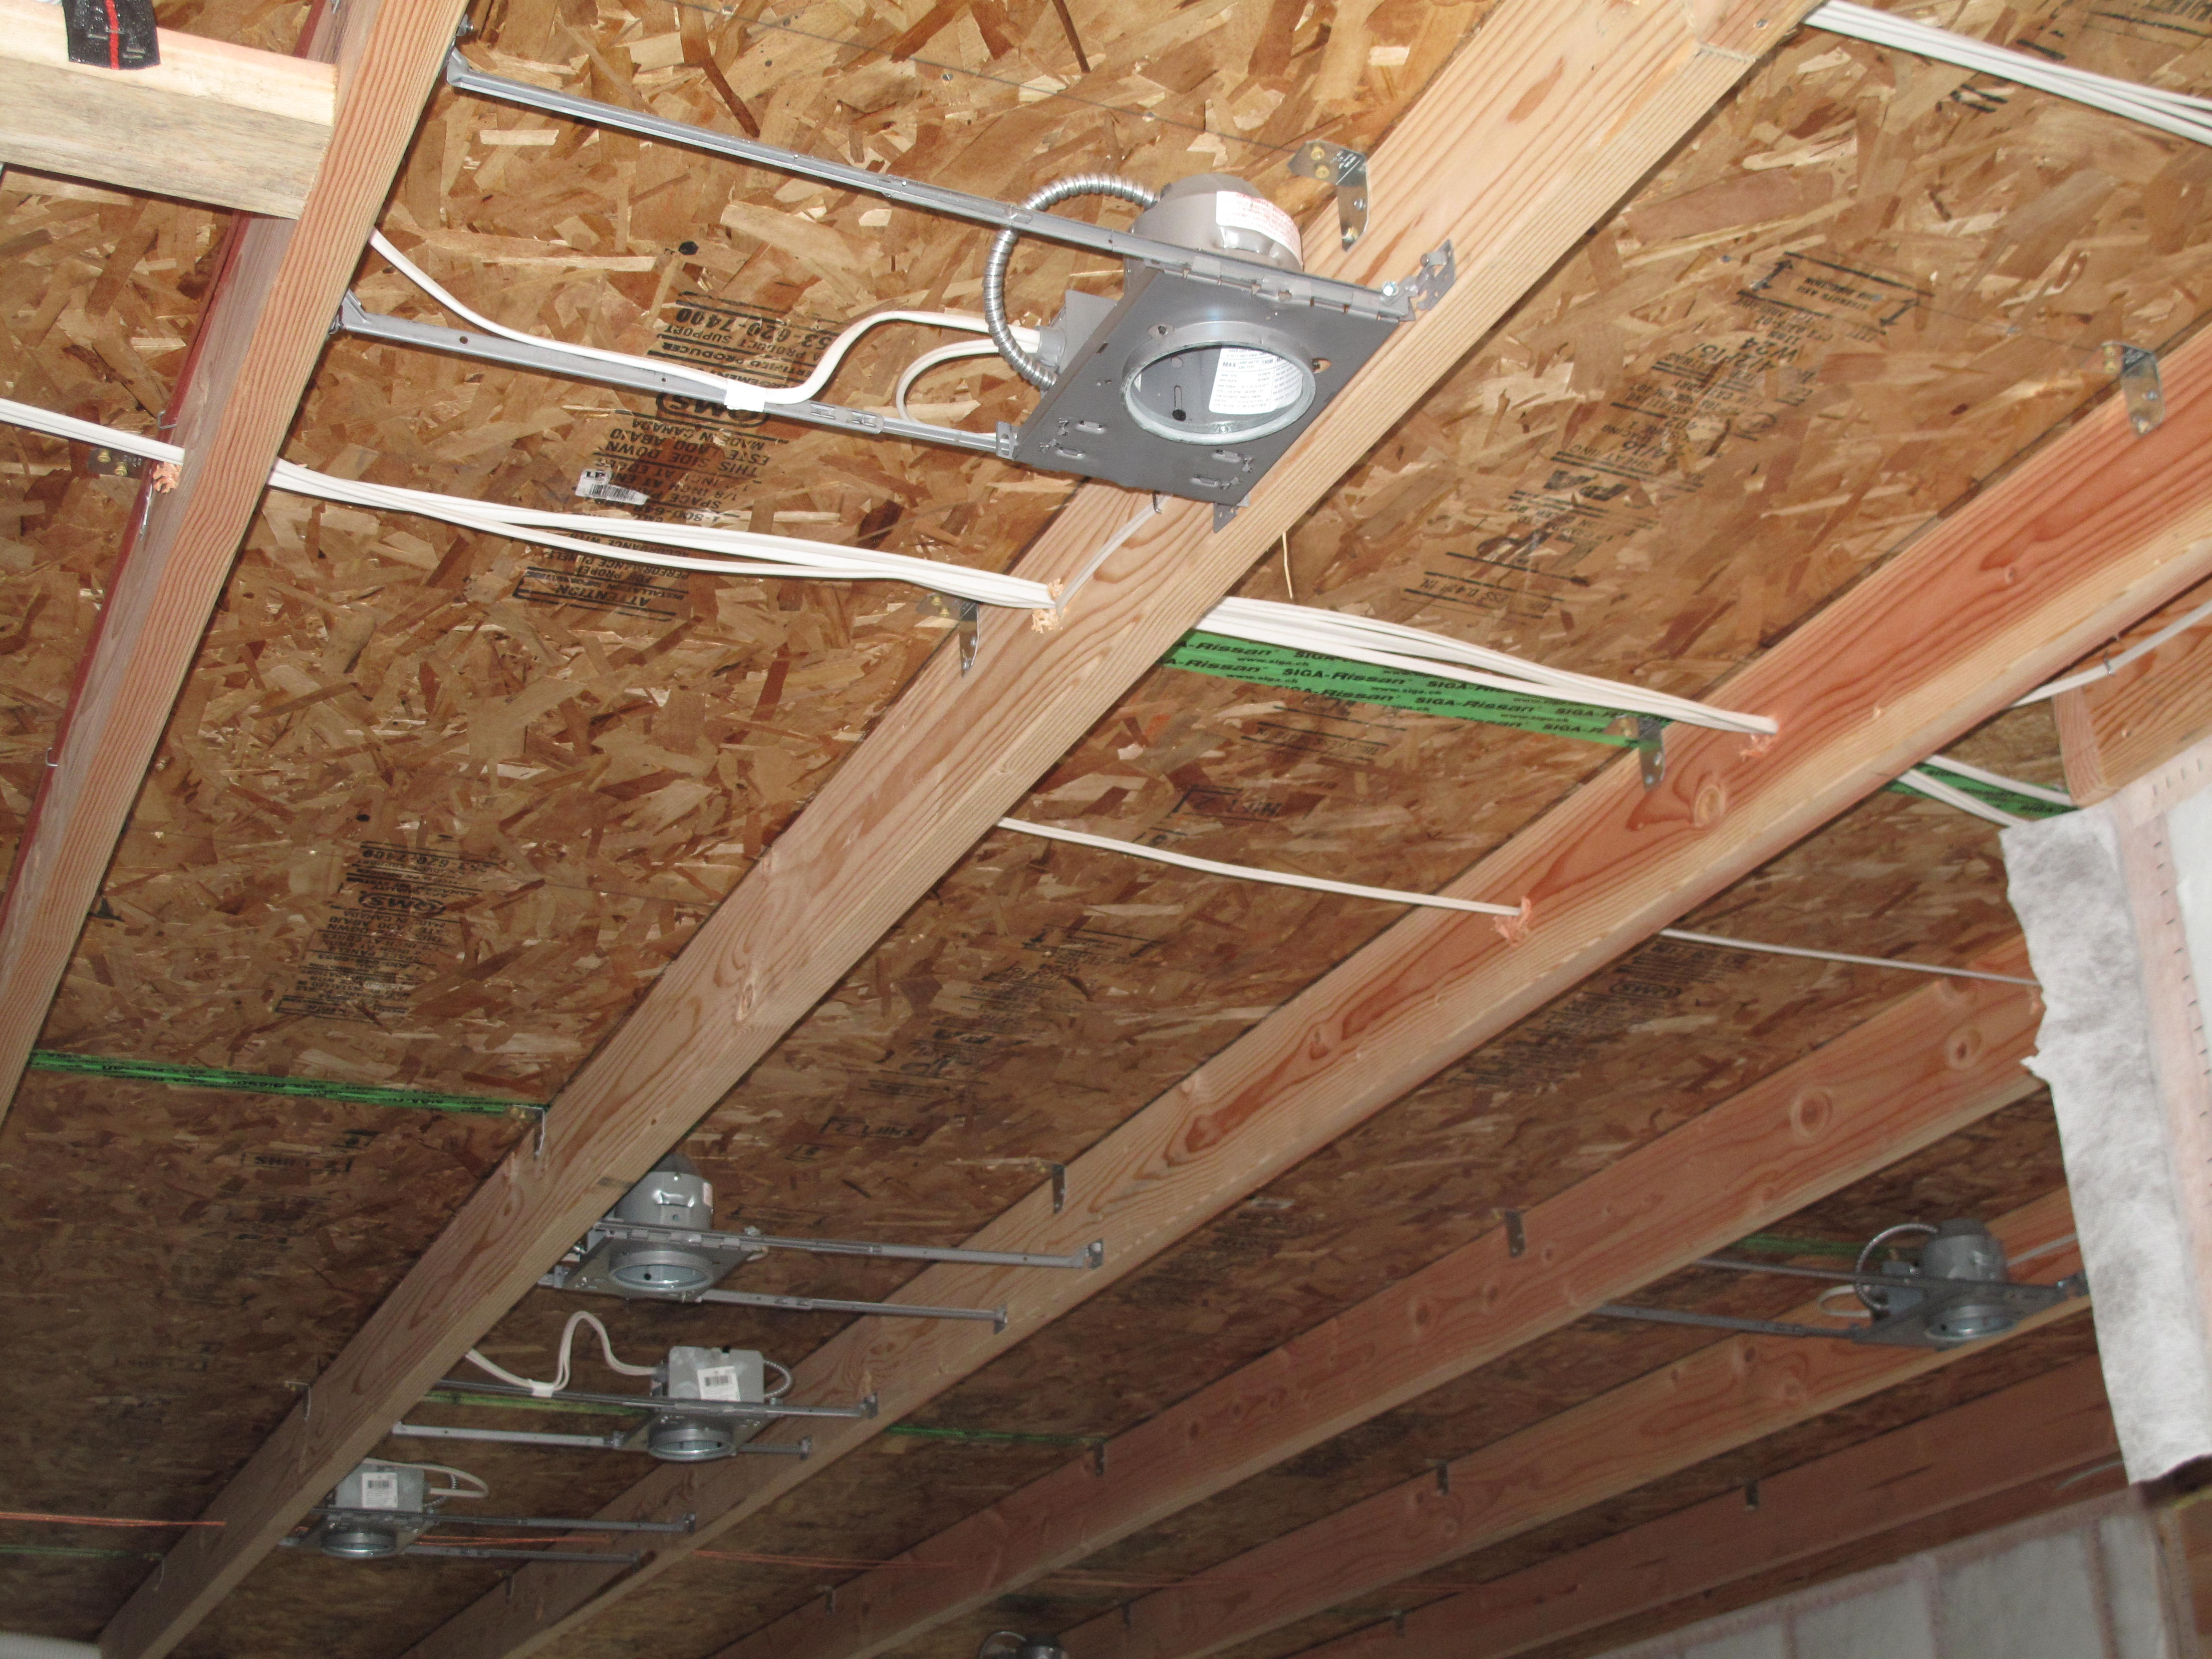 Service Cavities for Wiring and Plumbing   GreenBuildingAdvisor.com